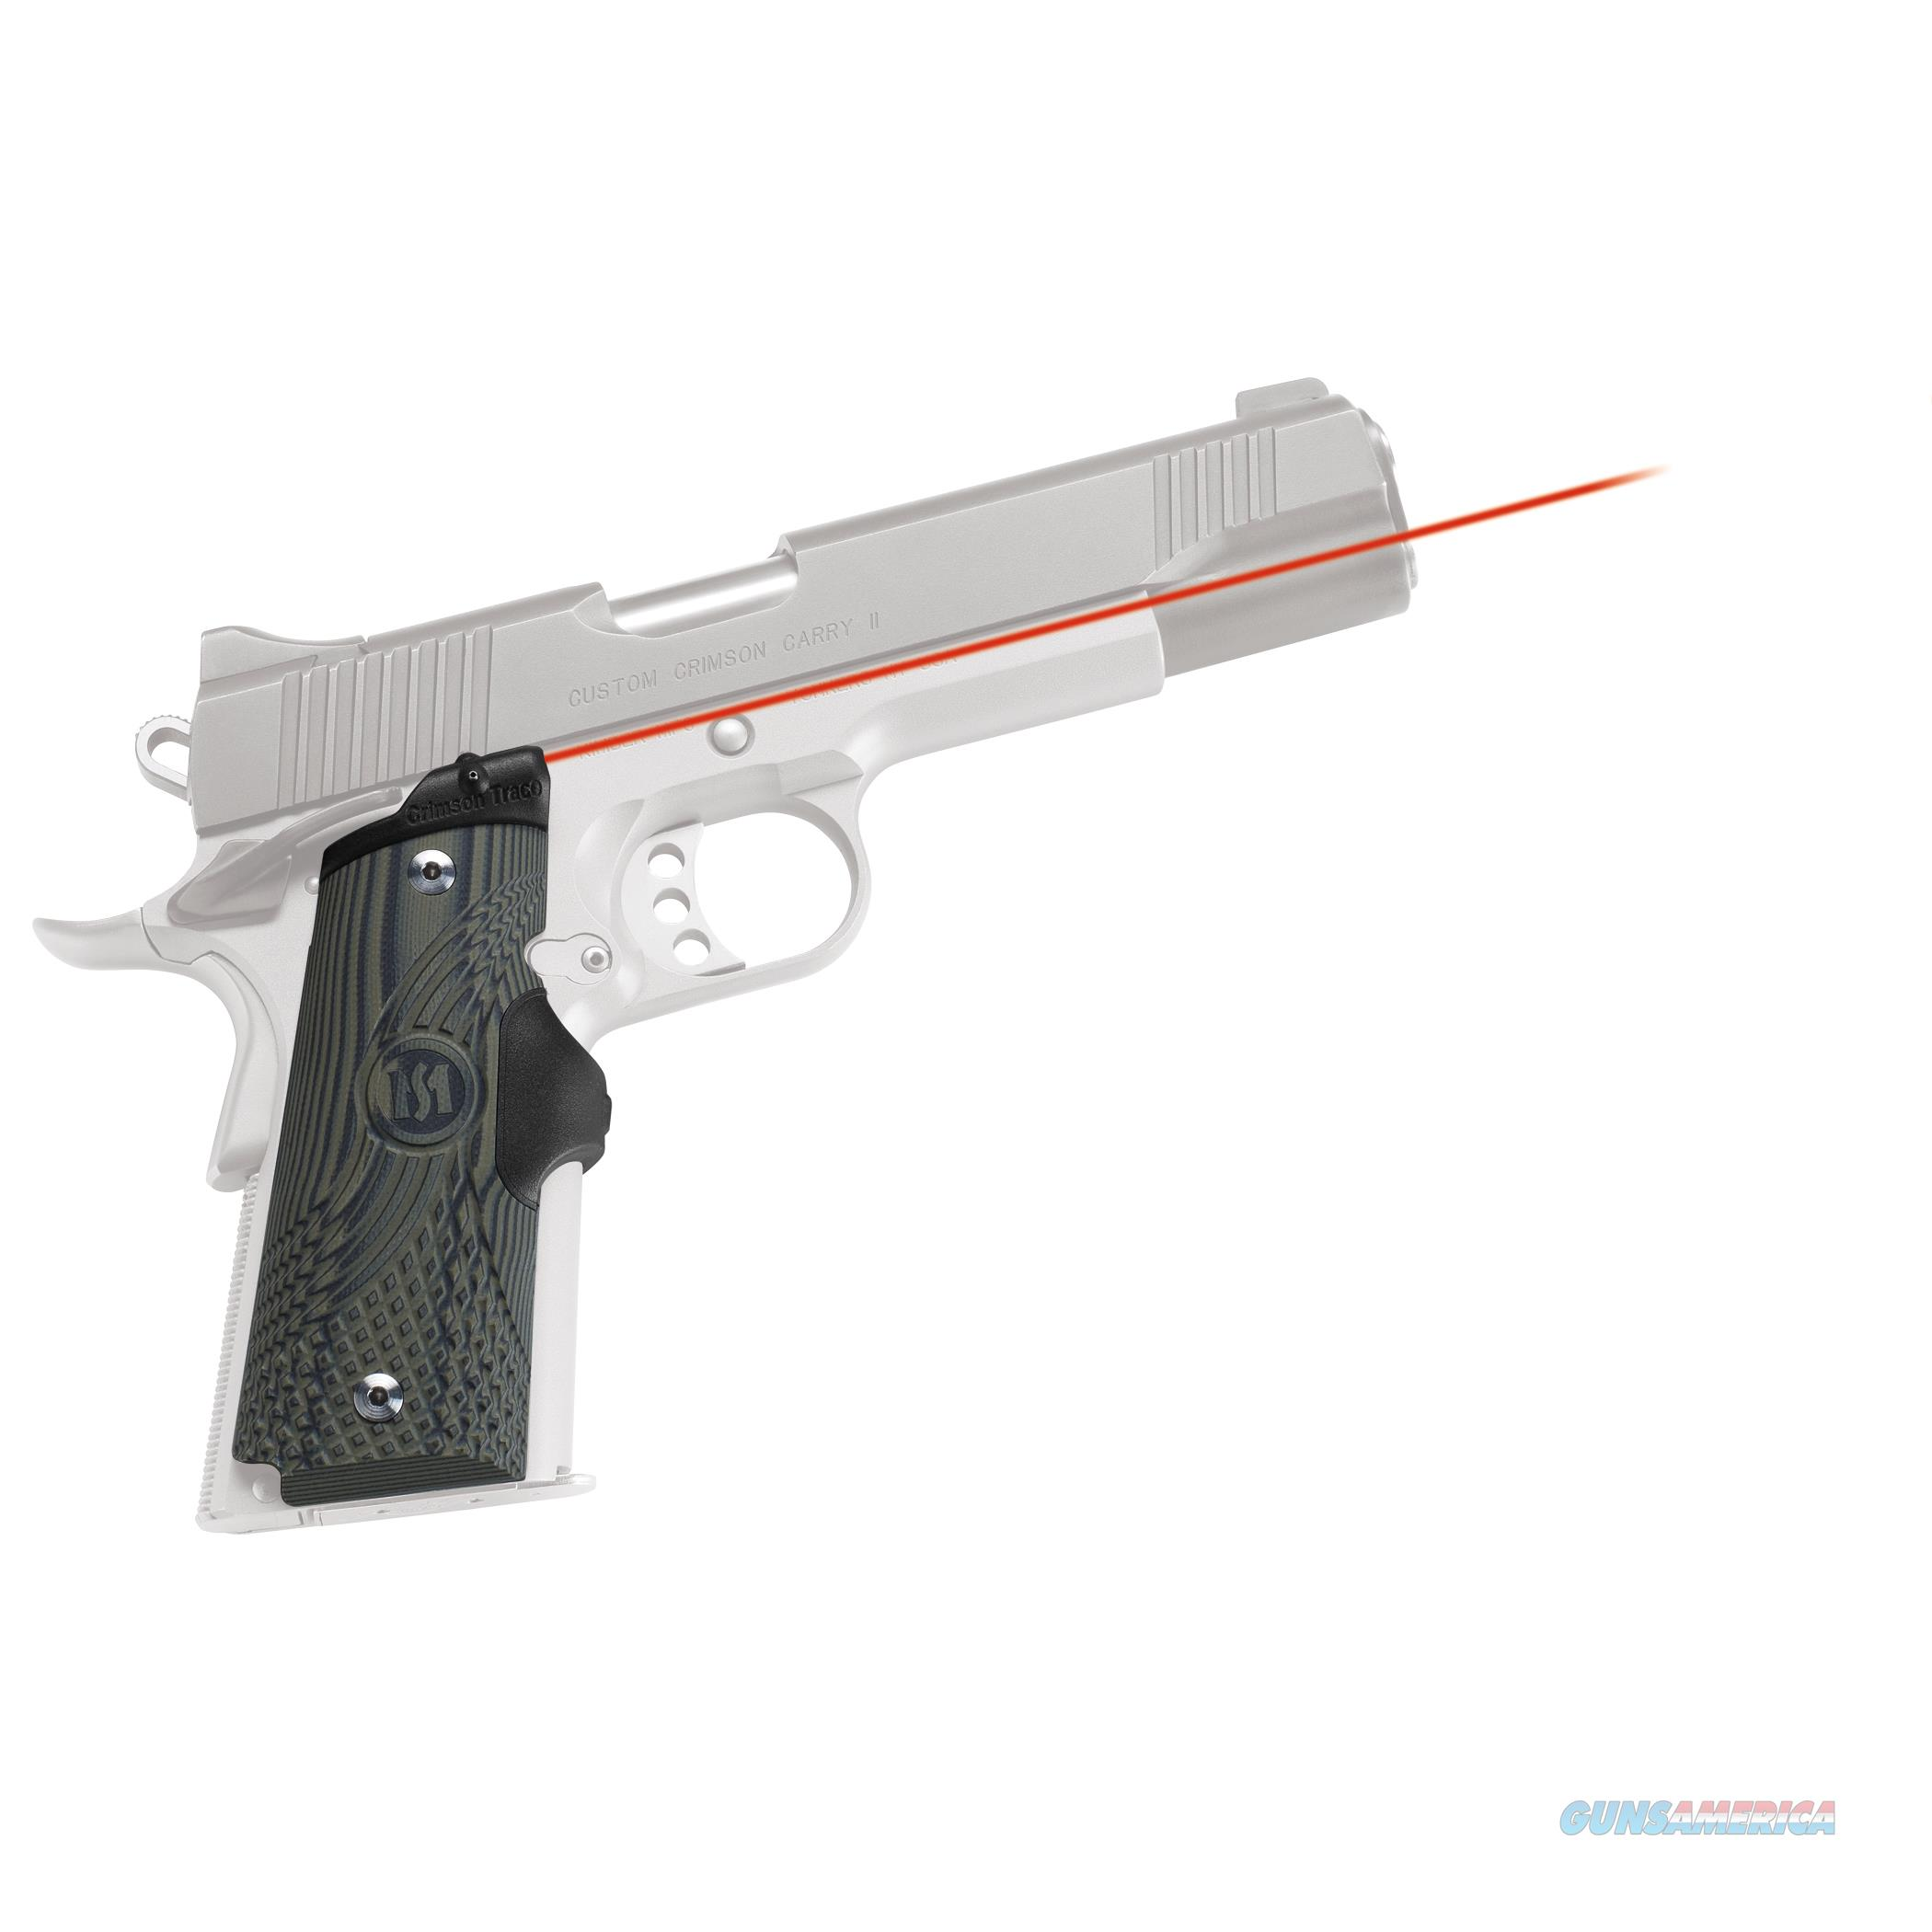 Crimson Trace 1911 Government/Commander LG-910  Non-Guns > Iron/Metal/Peep Sights